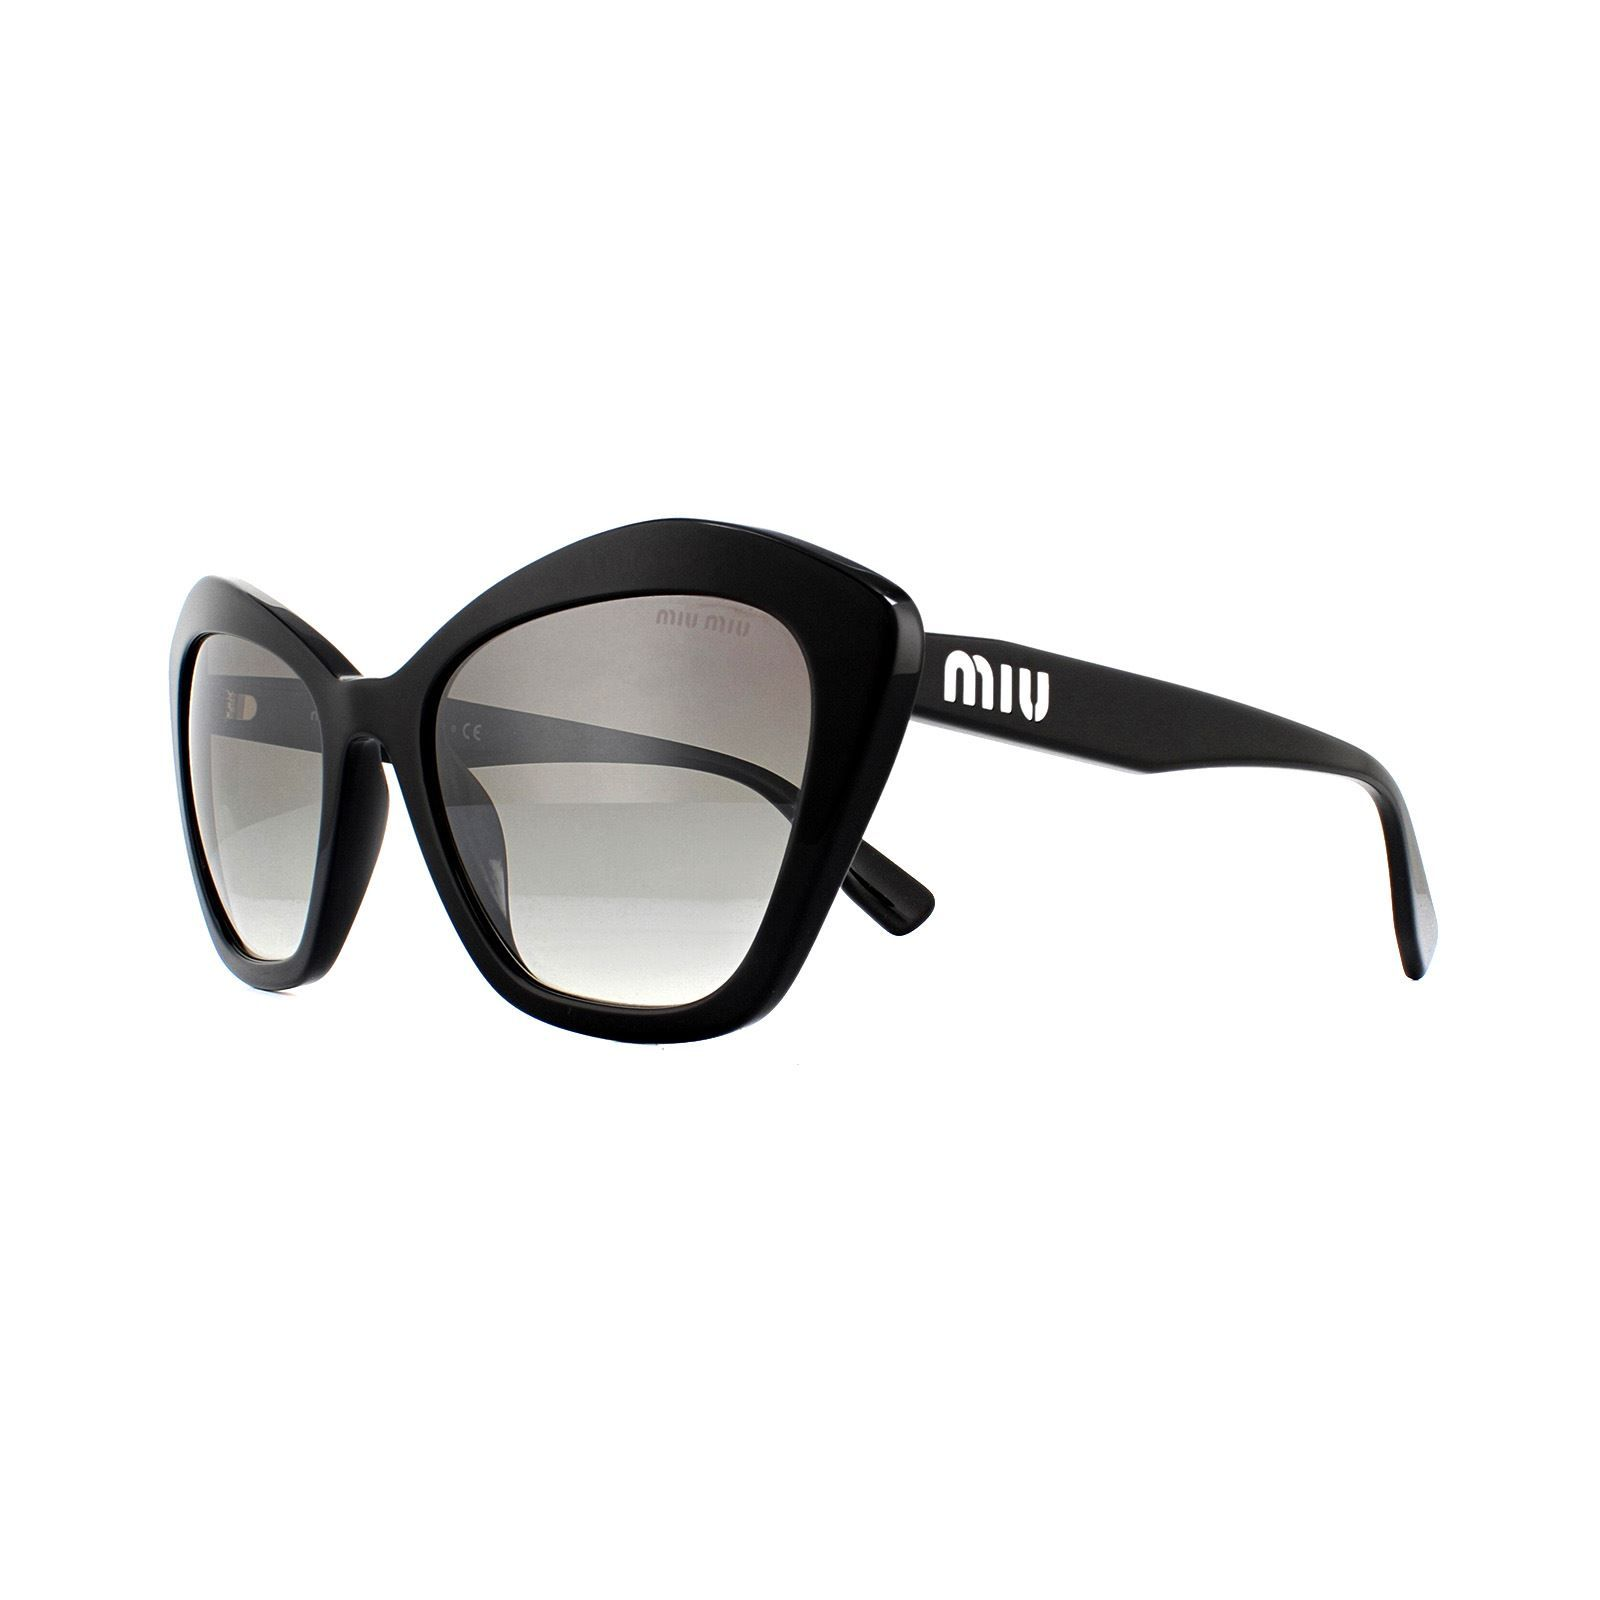 Miu Miu Sunglasses MU05US 1AB5O0 Black Gradient Grey Mirror Silver